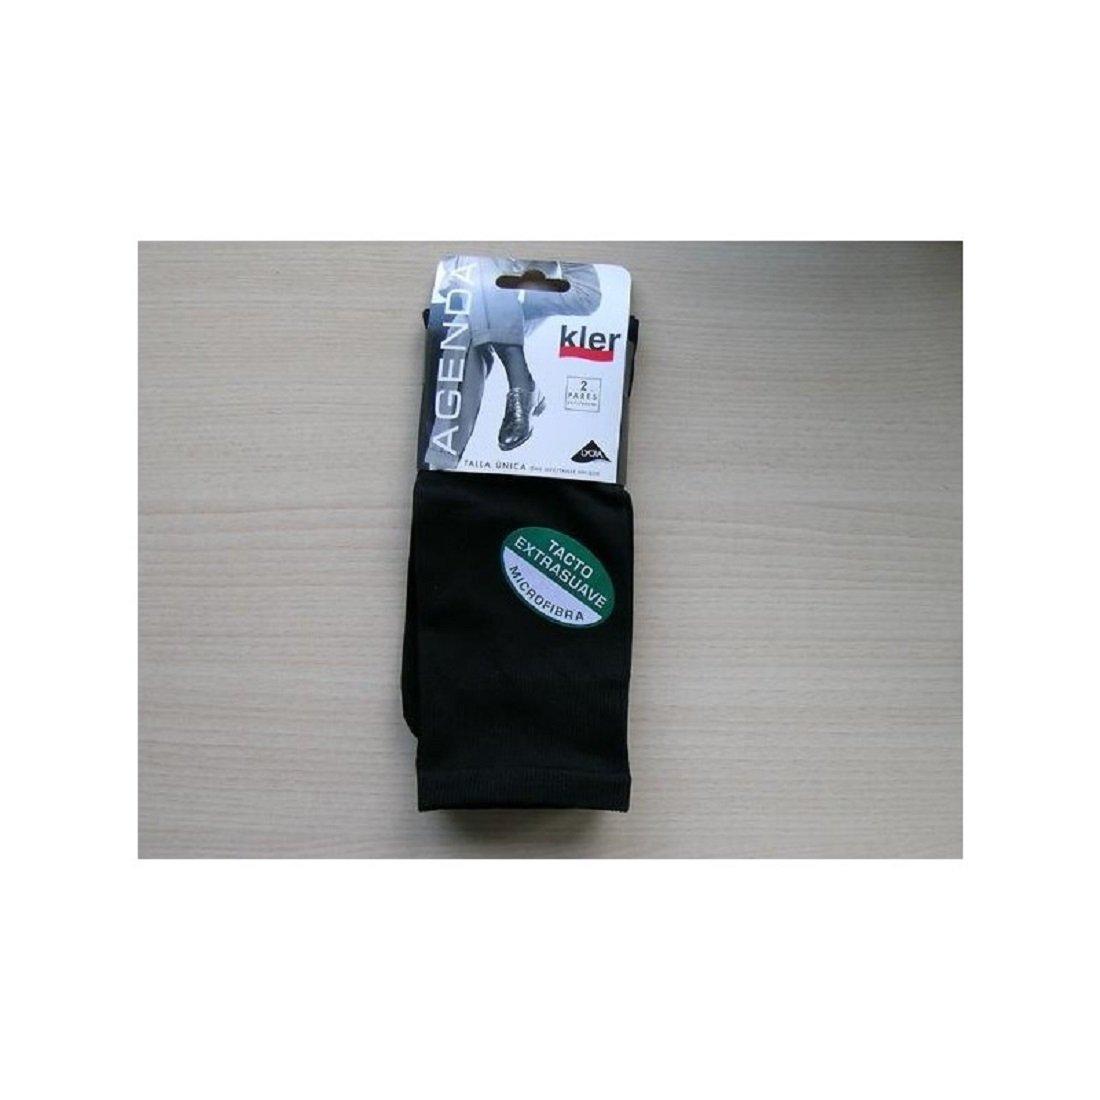 kler 6057 - calcetin caballero pack 2 pares. (UNICA, NEGRO): Amazon.es: Ropa y accesorios